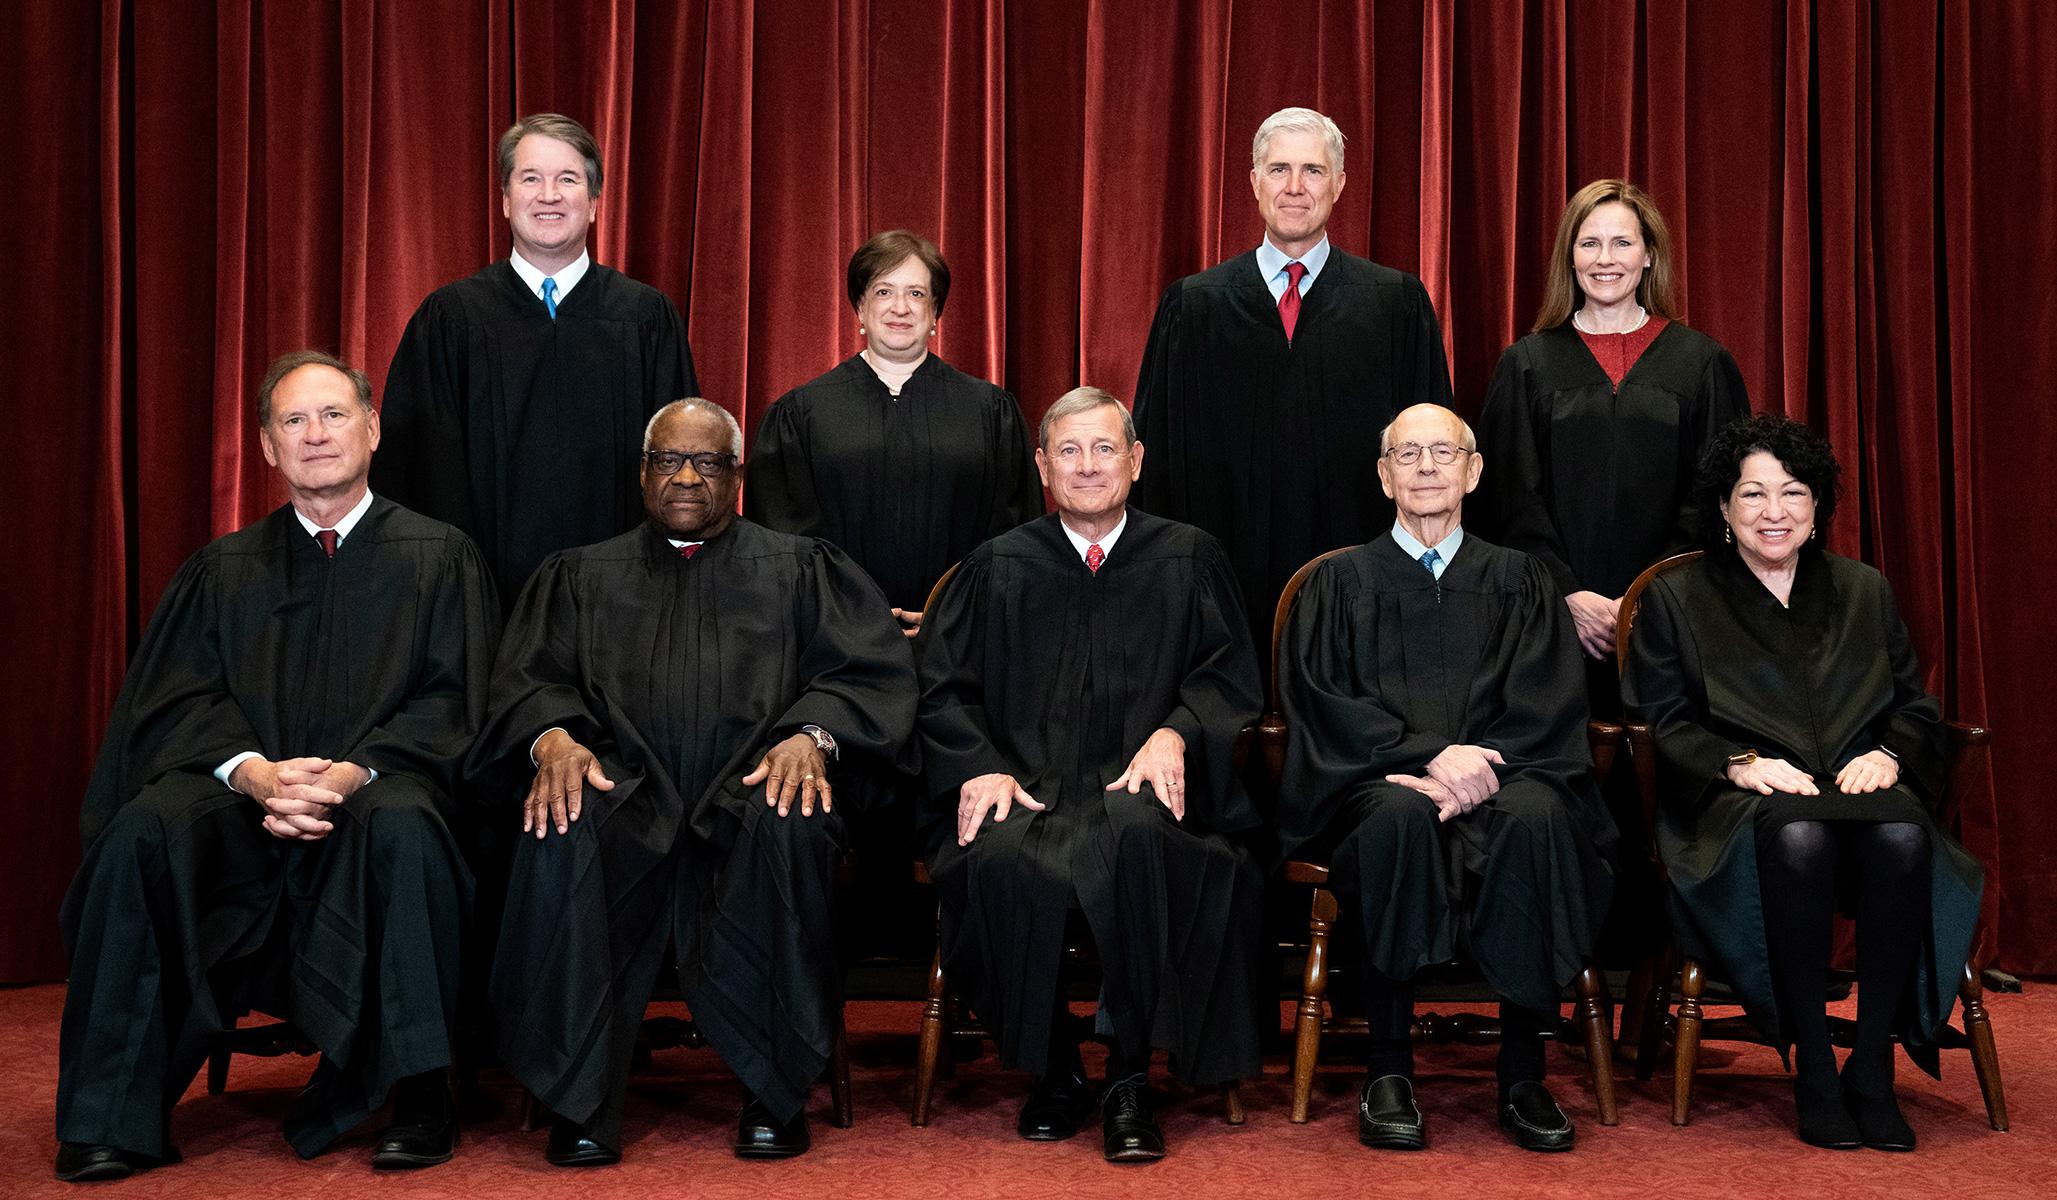 The 'Keep Nine' Amendment Can Save the Supreme Court